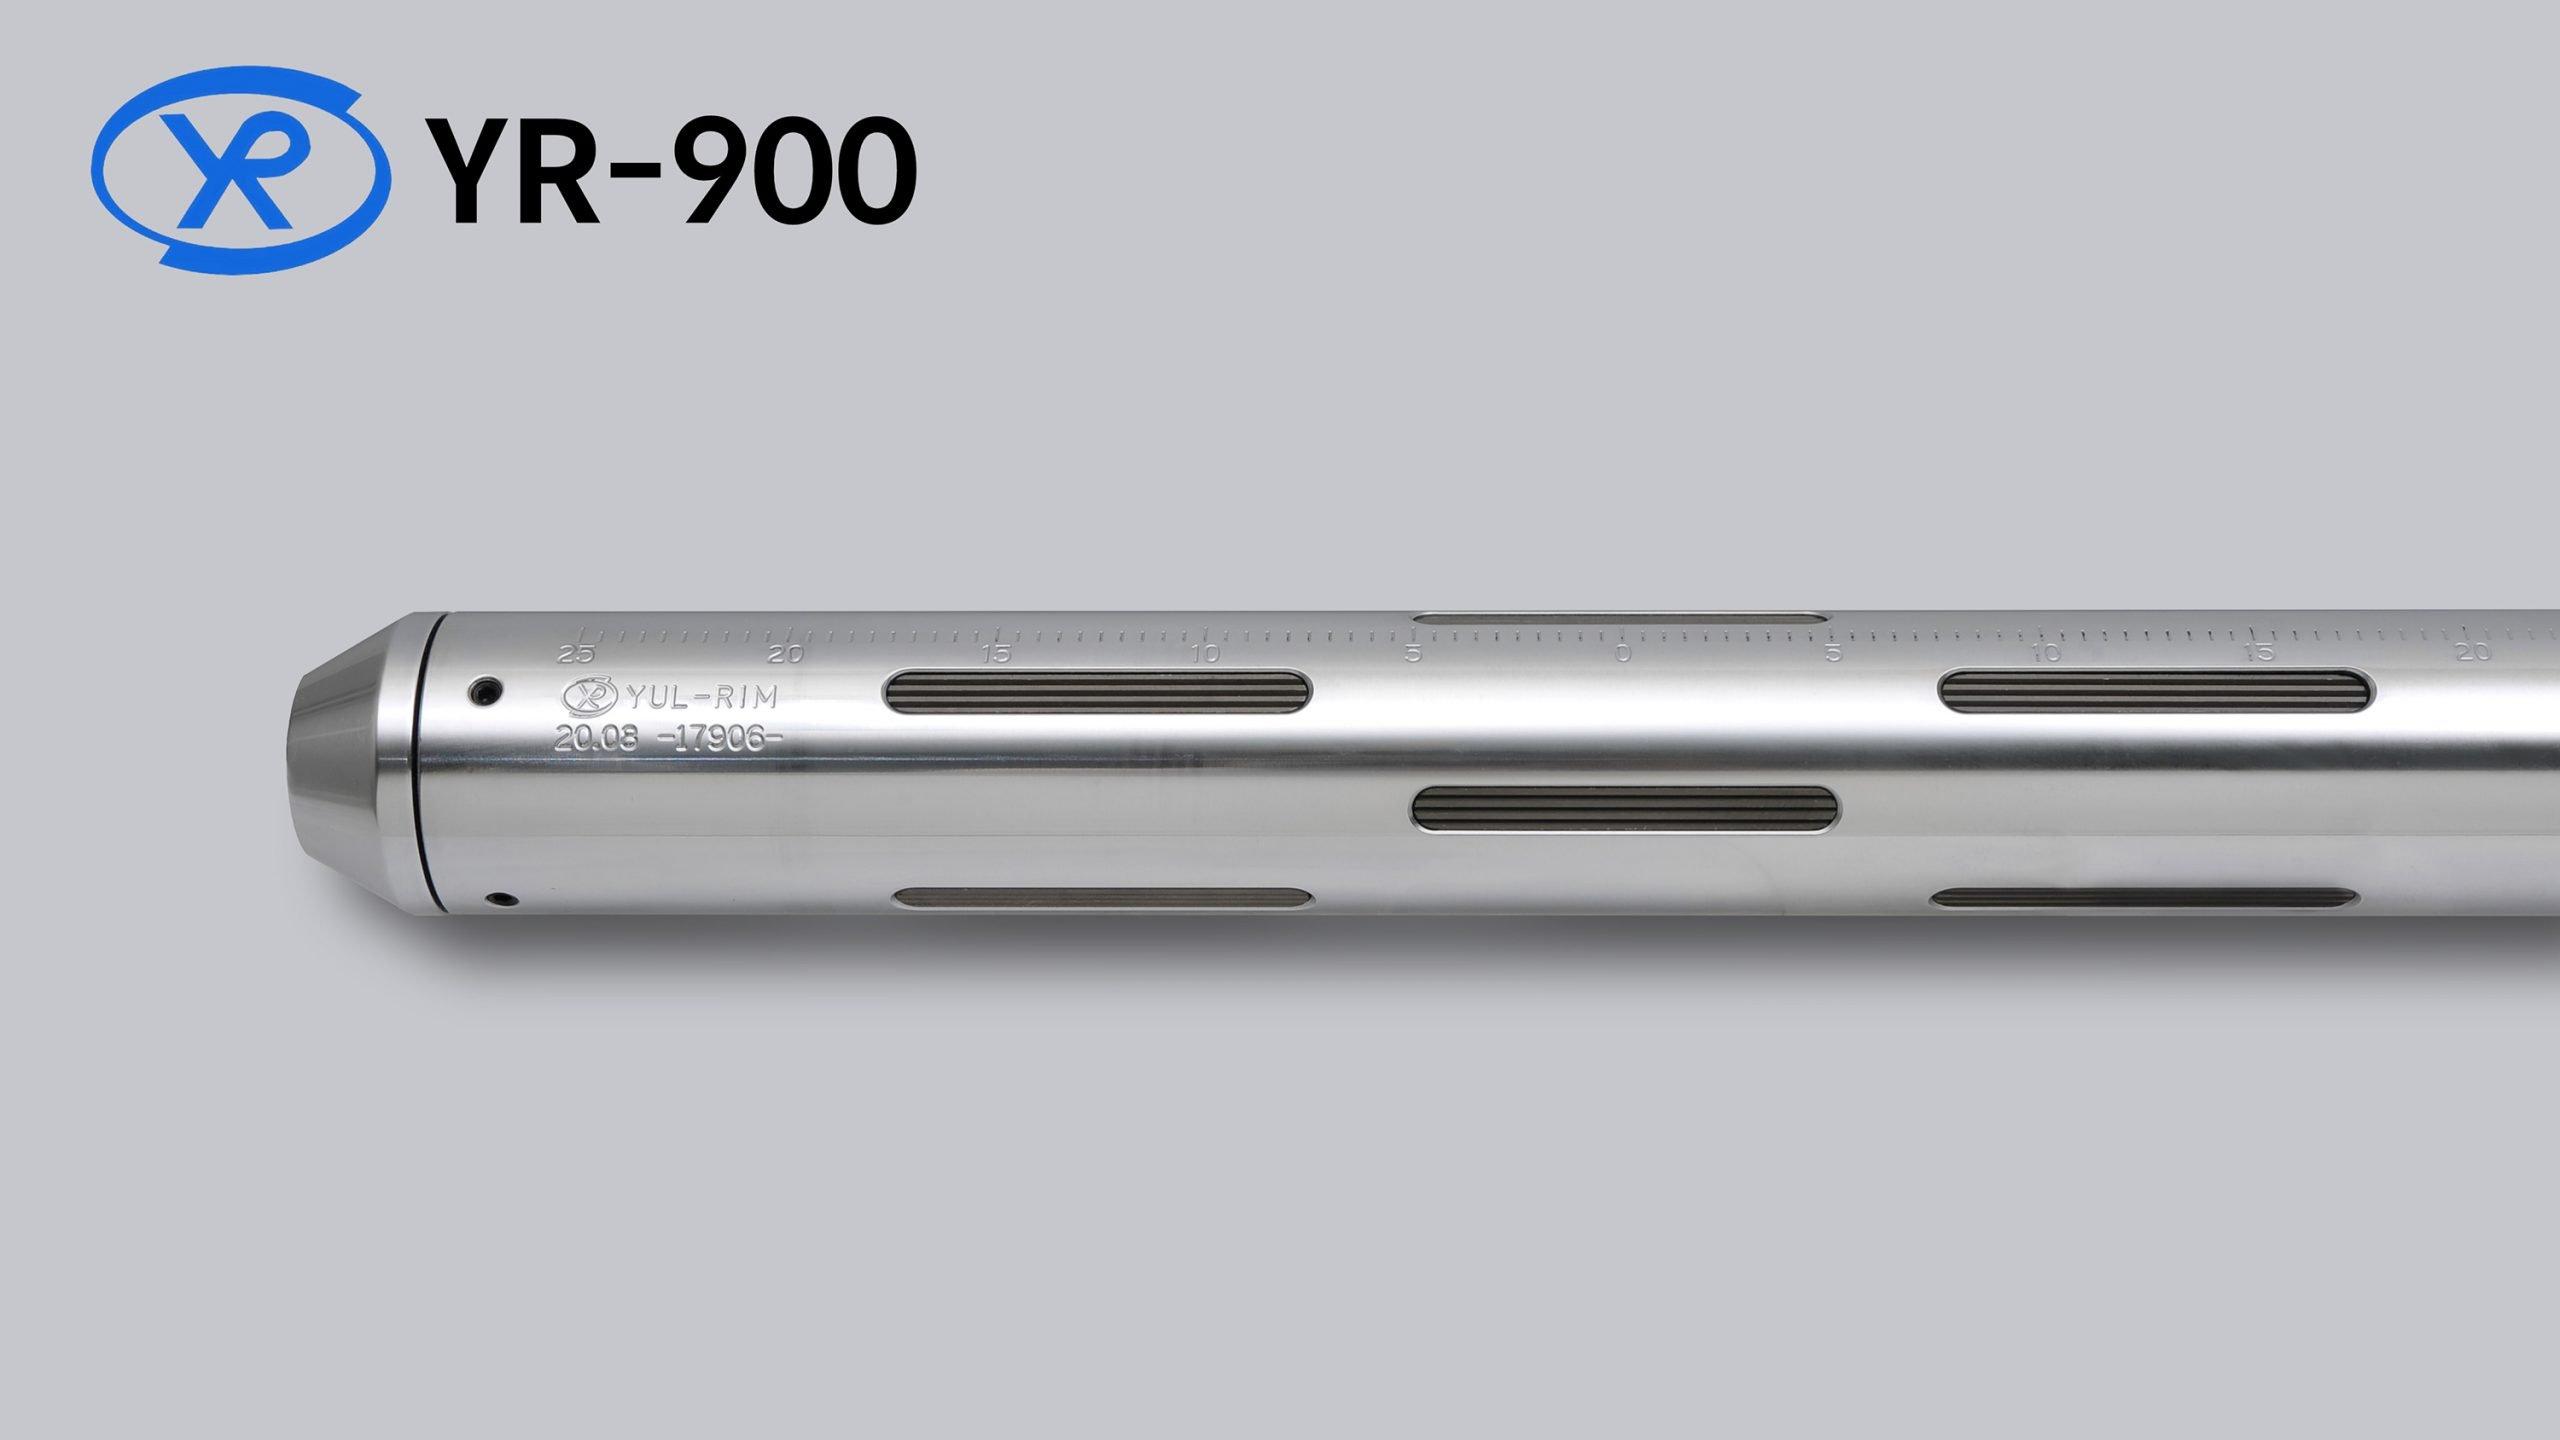 YR-900